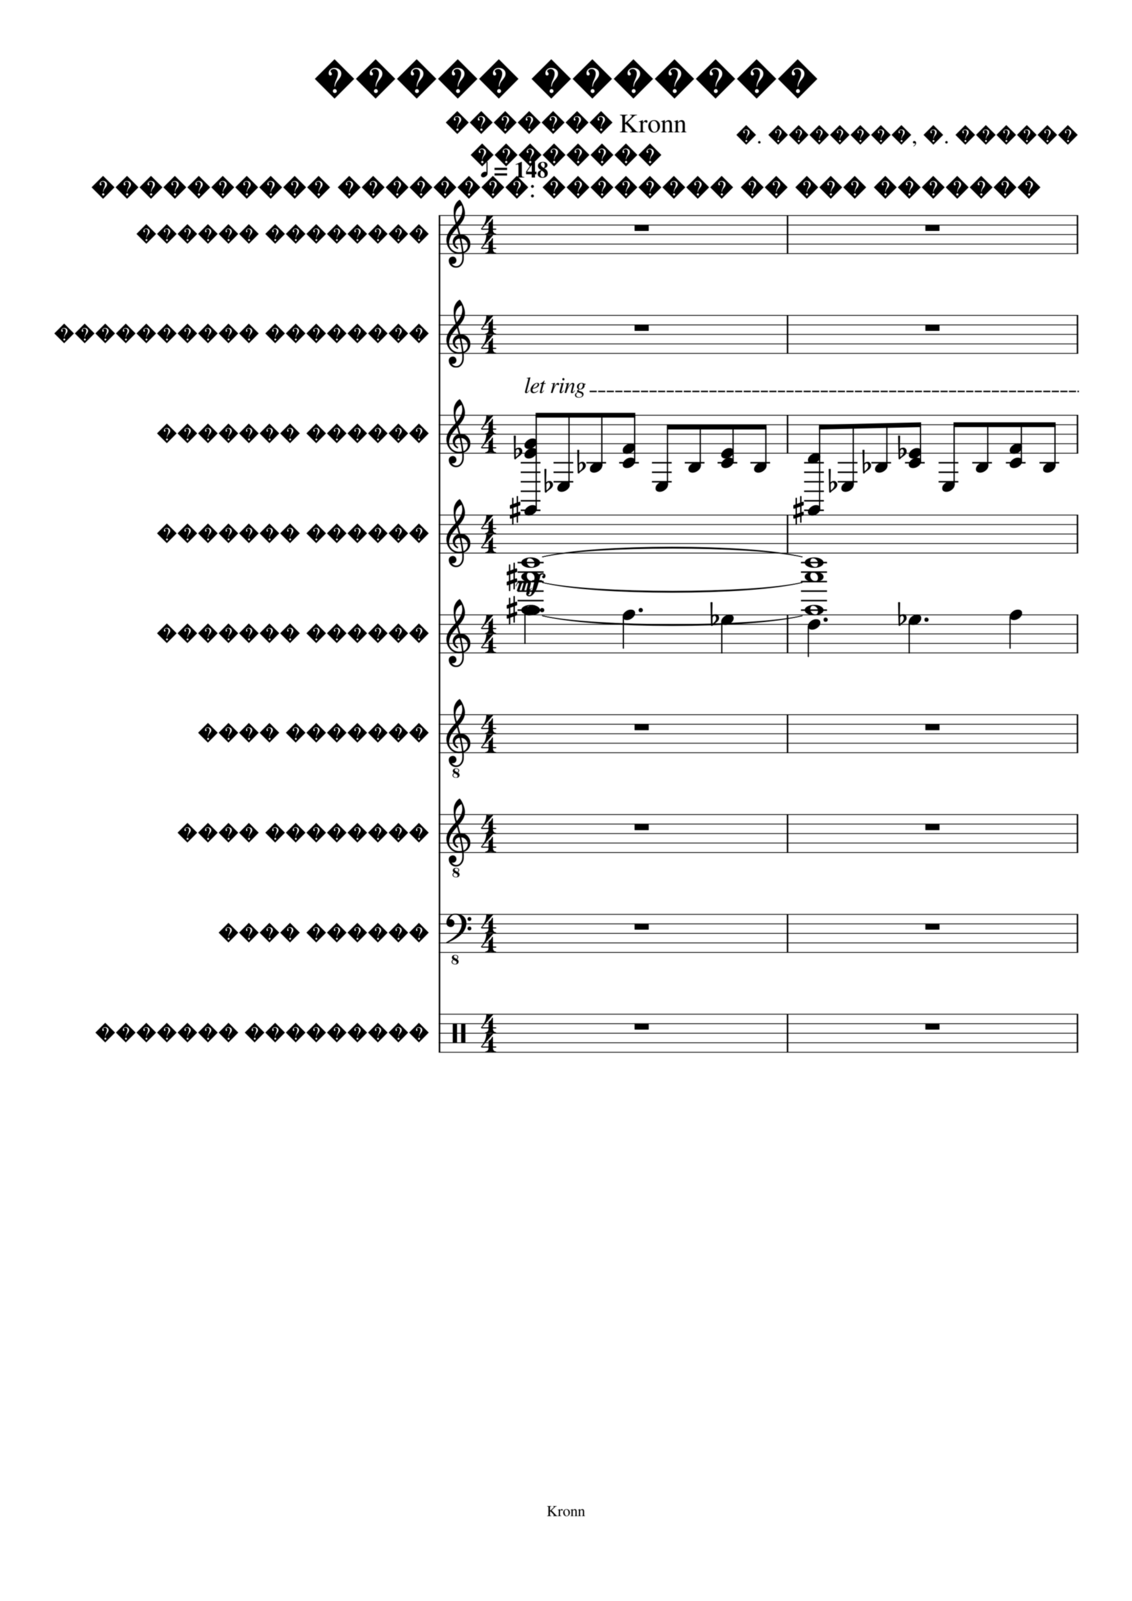 Okean Pustotyi slide, Image 1